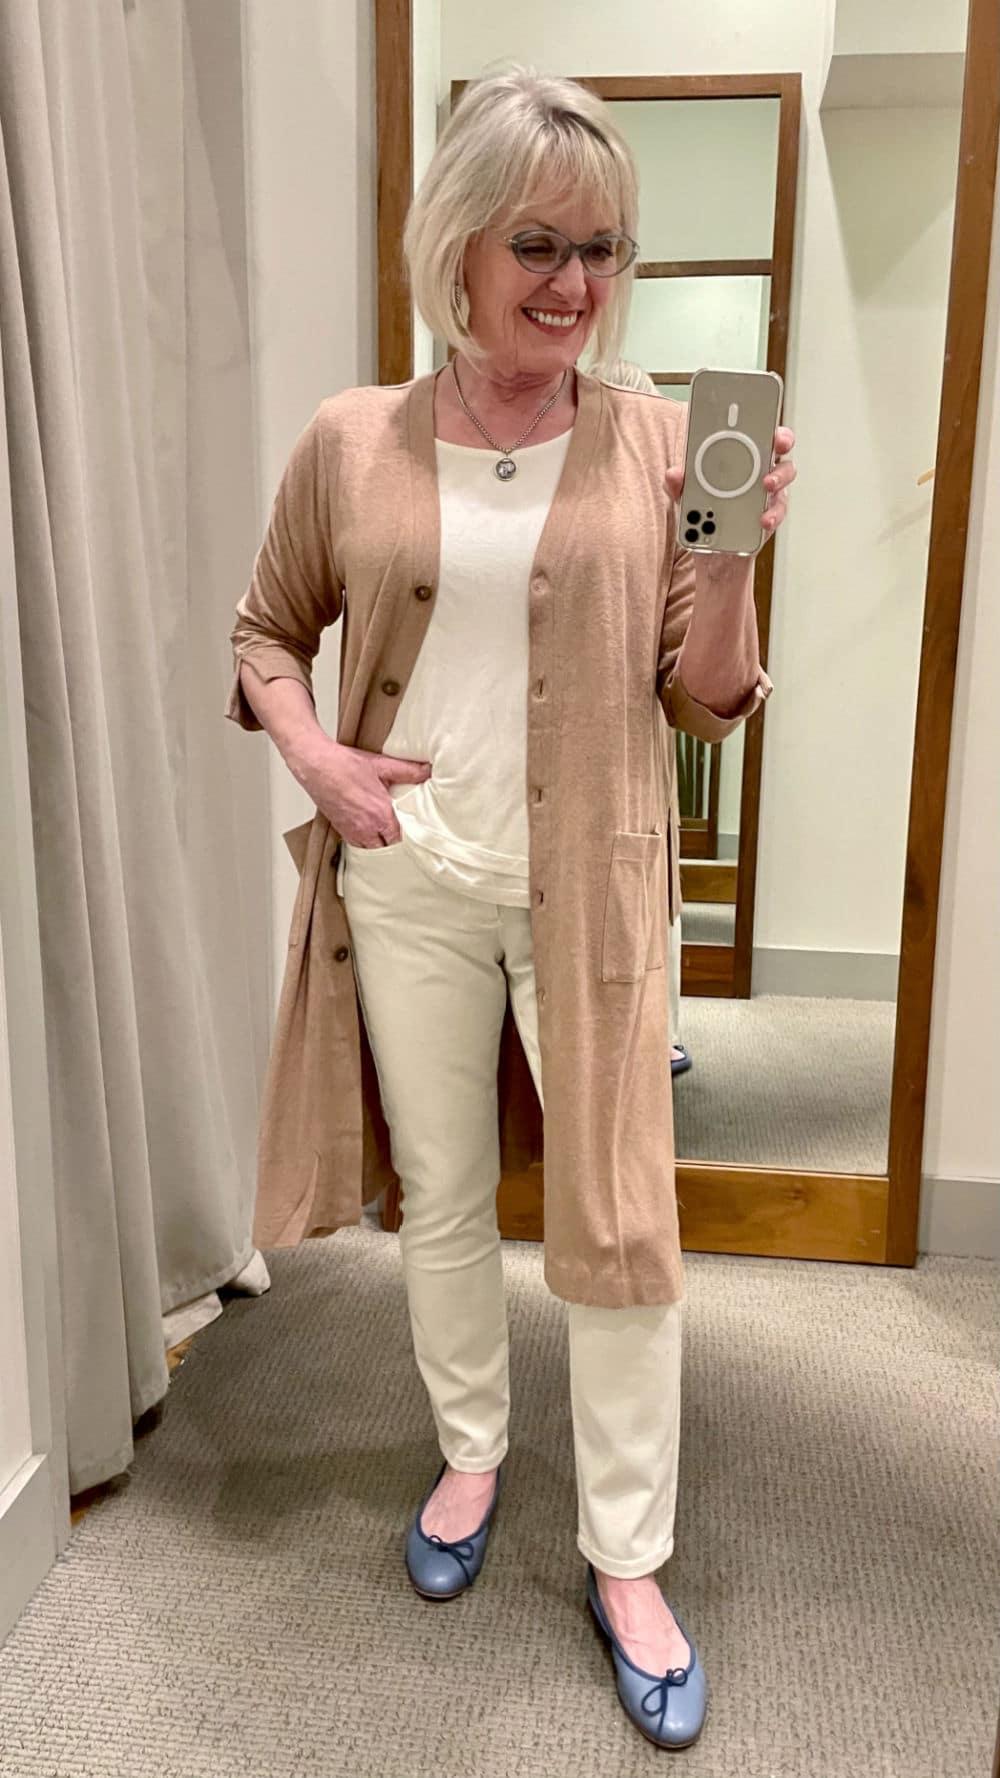 woman wearing long beige cardigan over beige tank top and jeans in J Jill dressing room